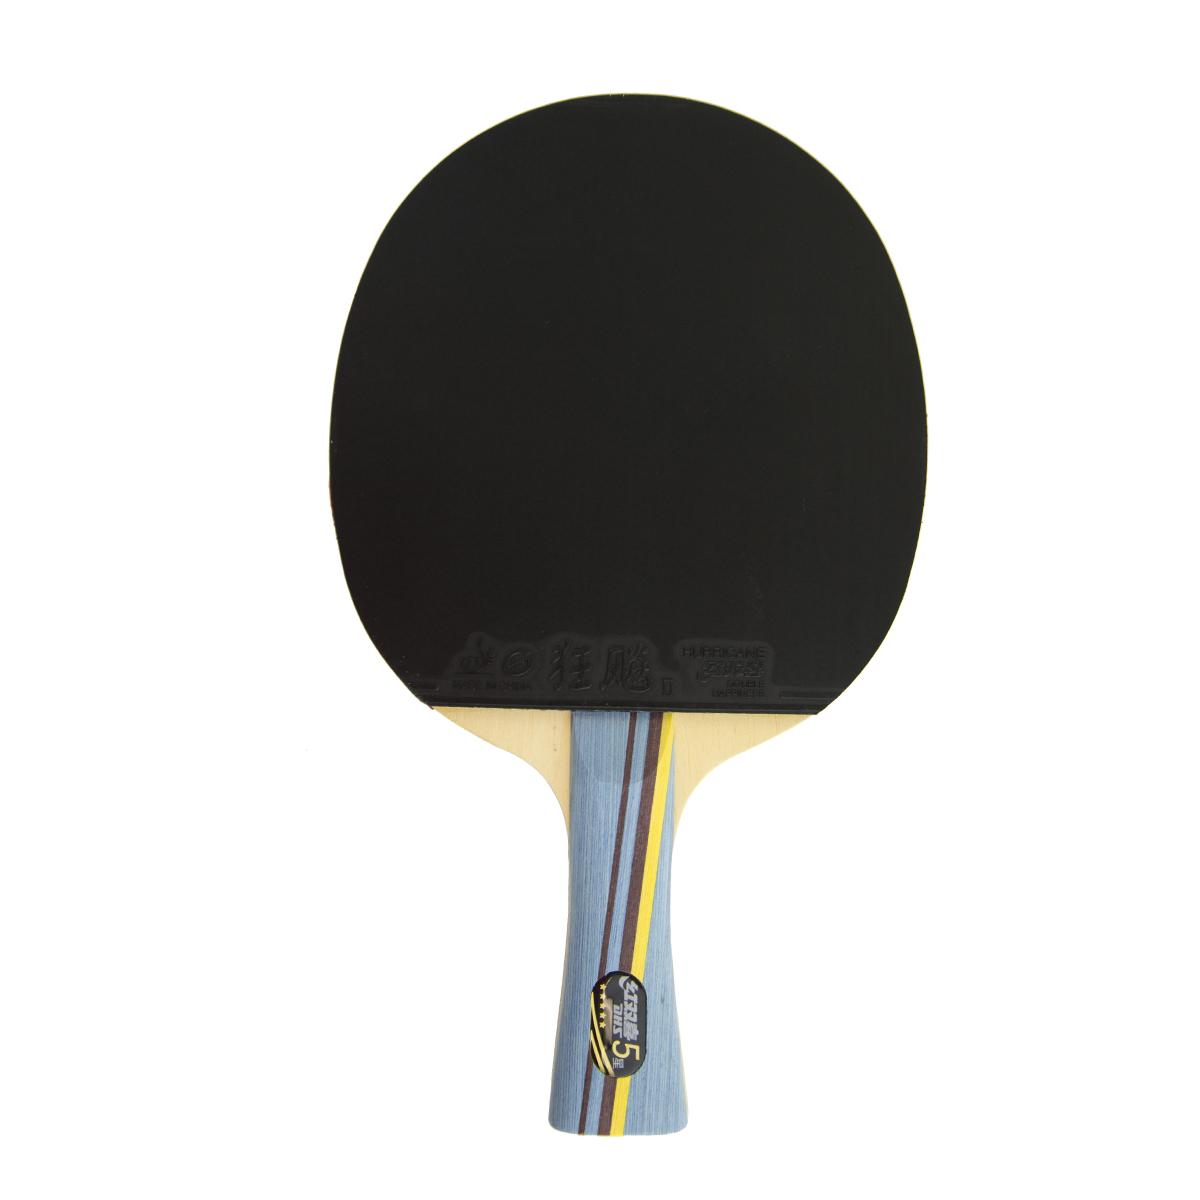 Pálka na stolní tenis DOUBLE HAPPINES 5002